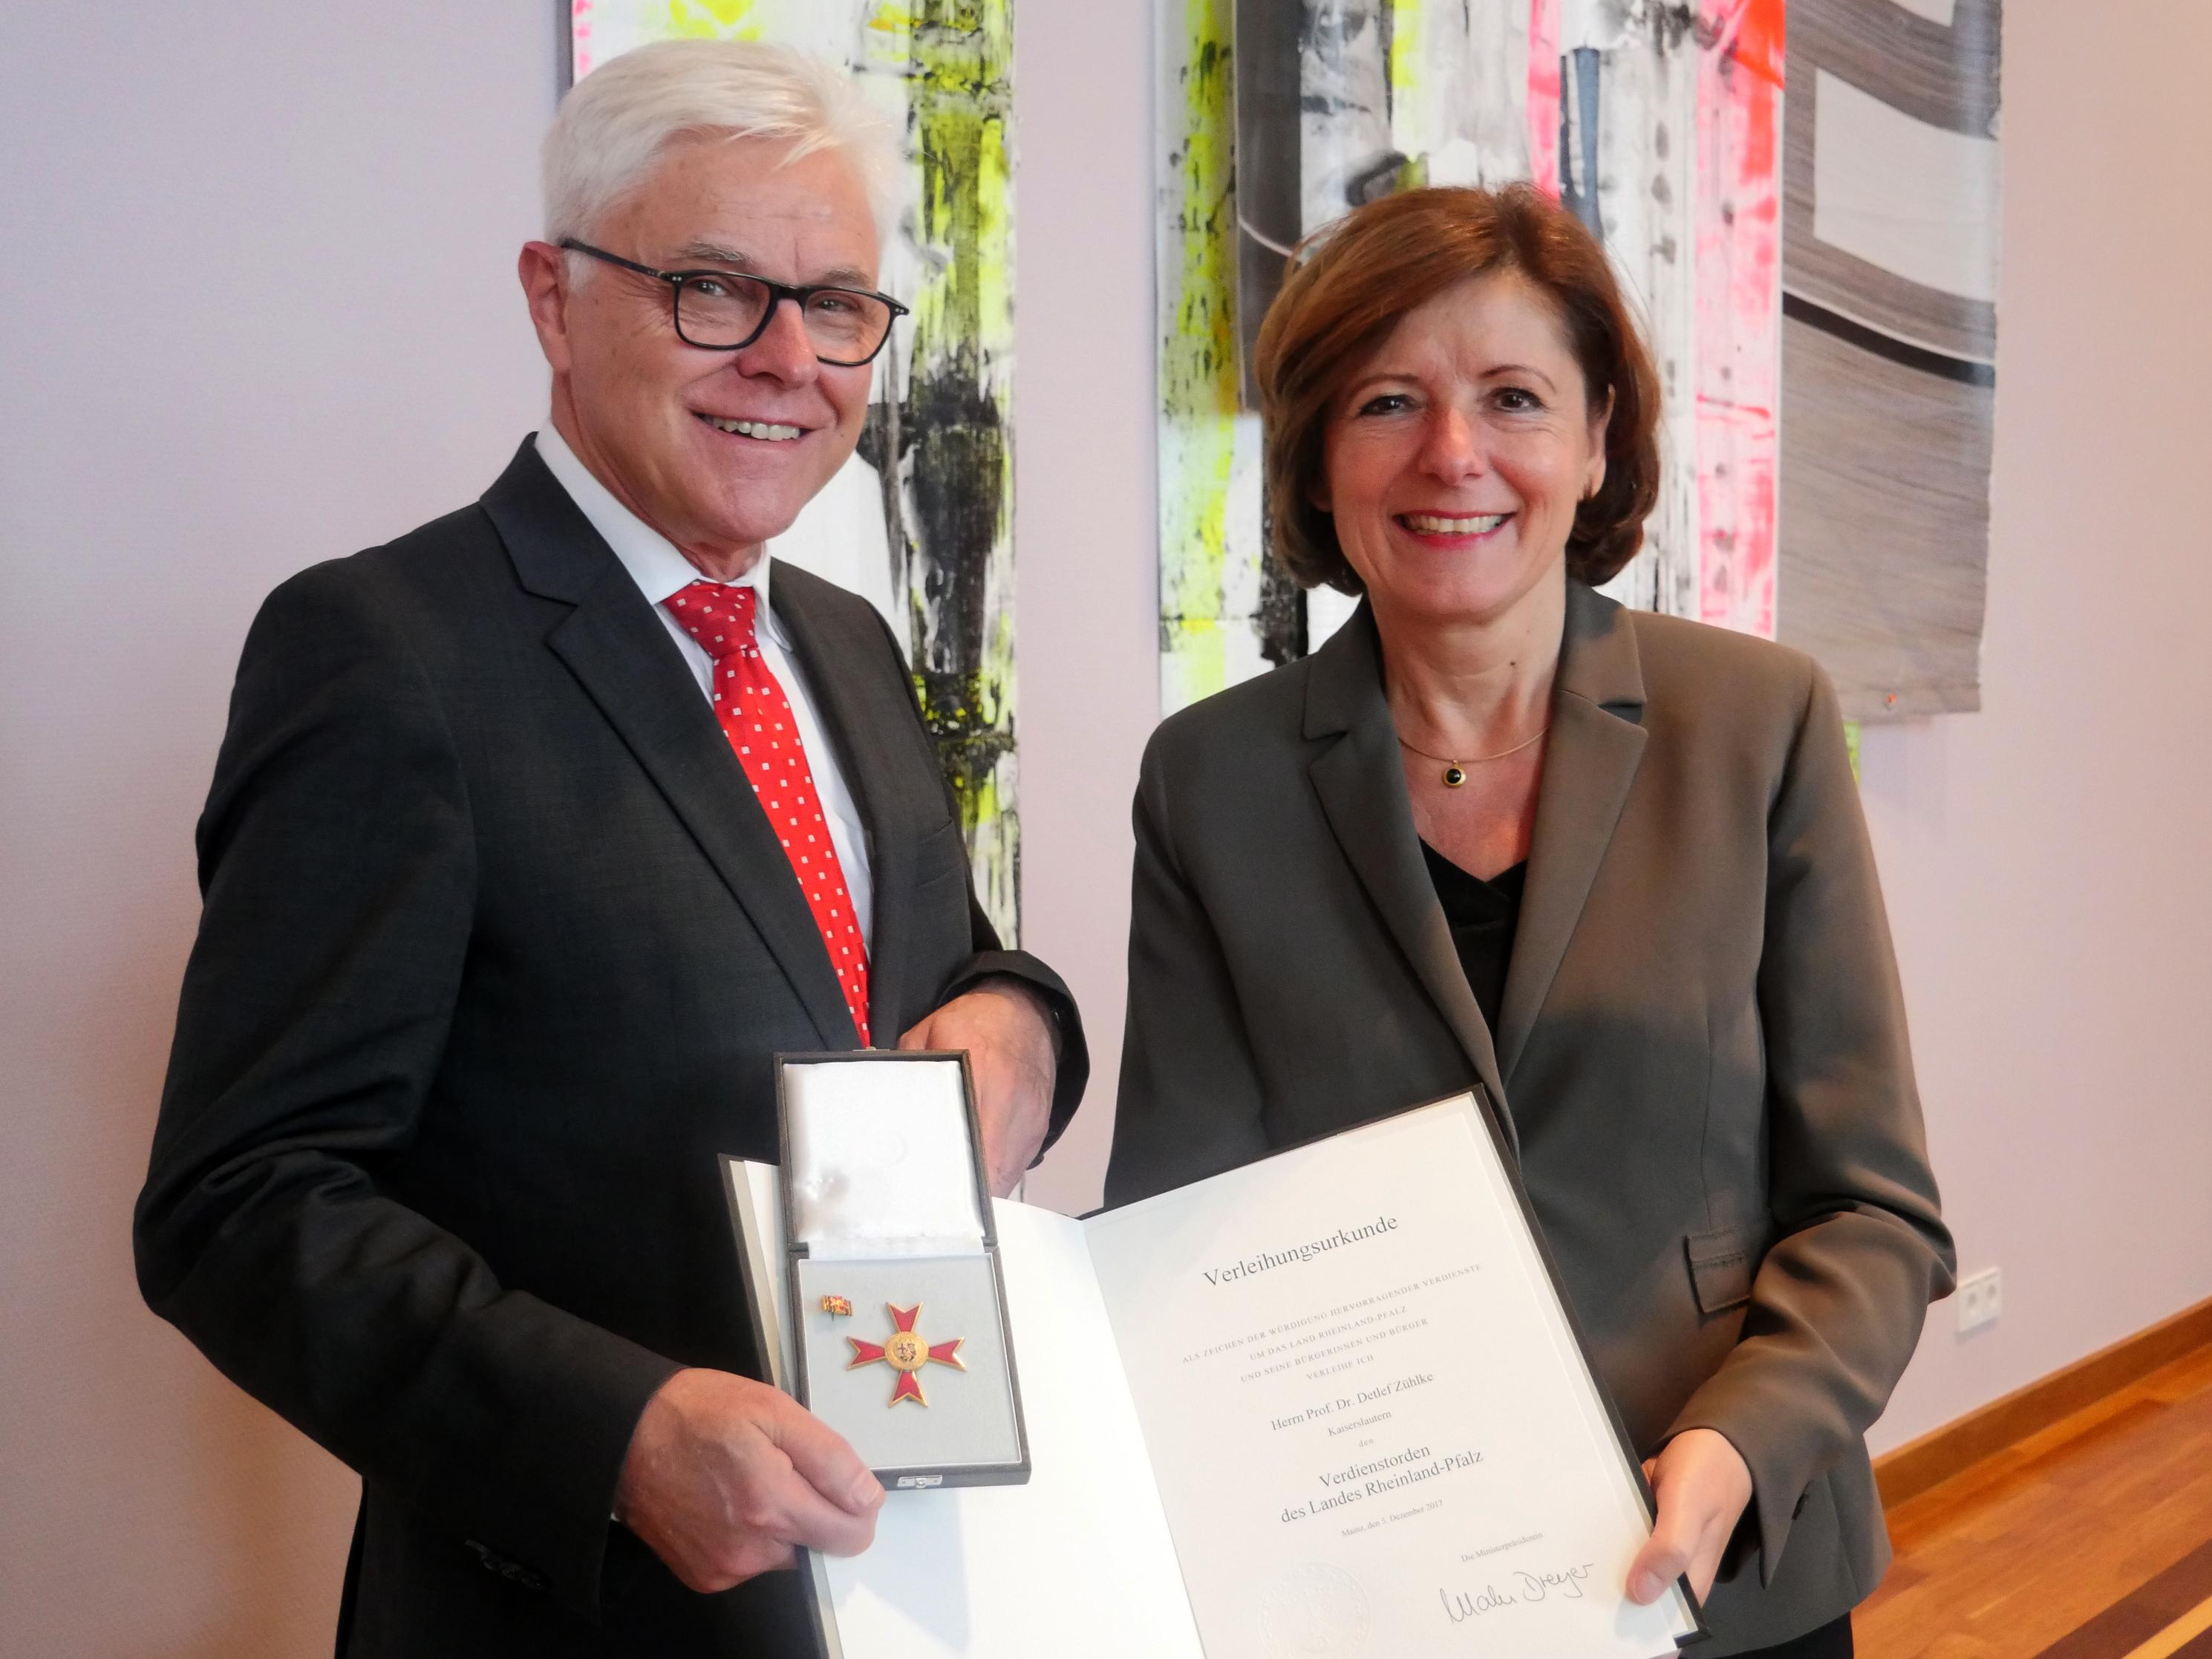 Malu Dreyer presents Order of Merit Award to Detlef Zühlke. Photo: © Staatskanzlei RLP